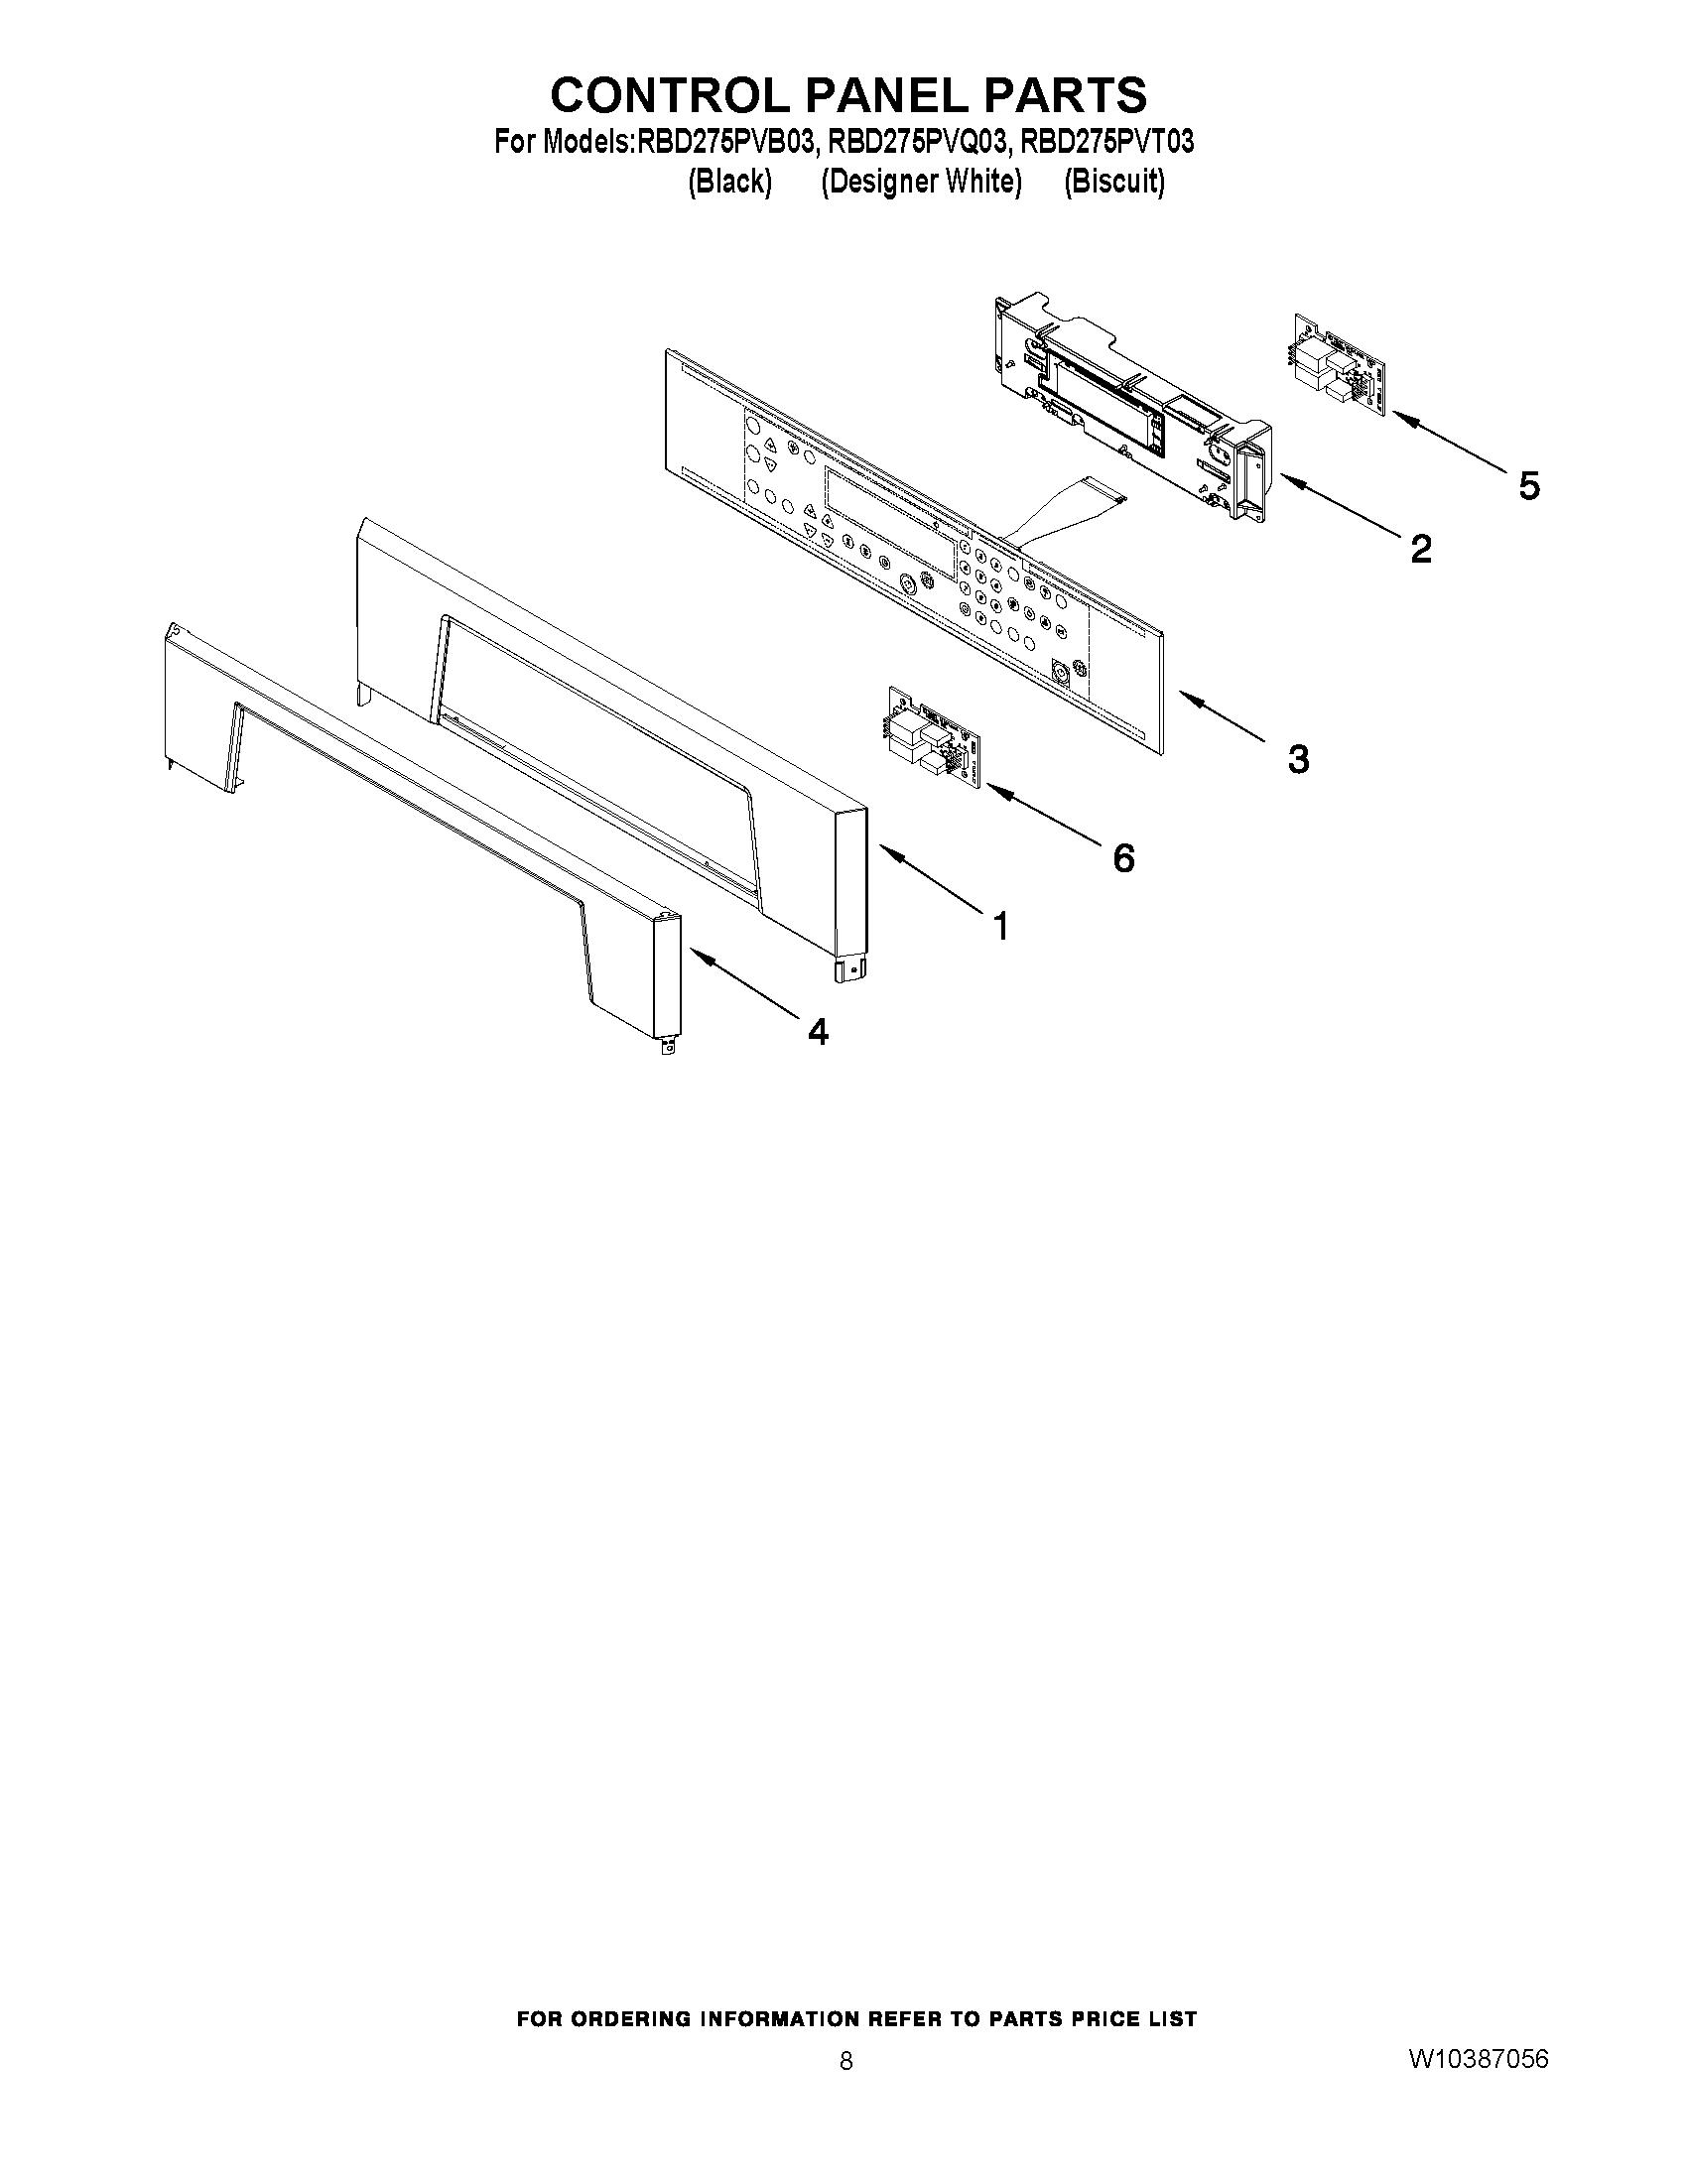 RBD275PVB03